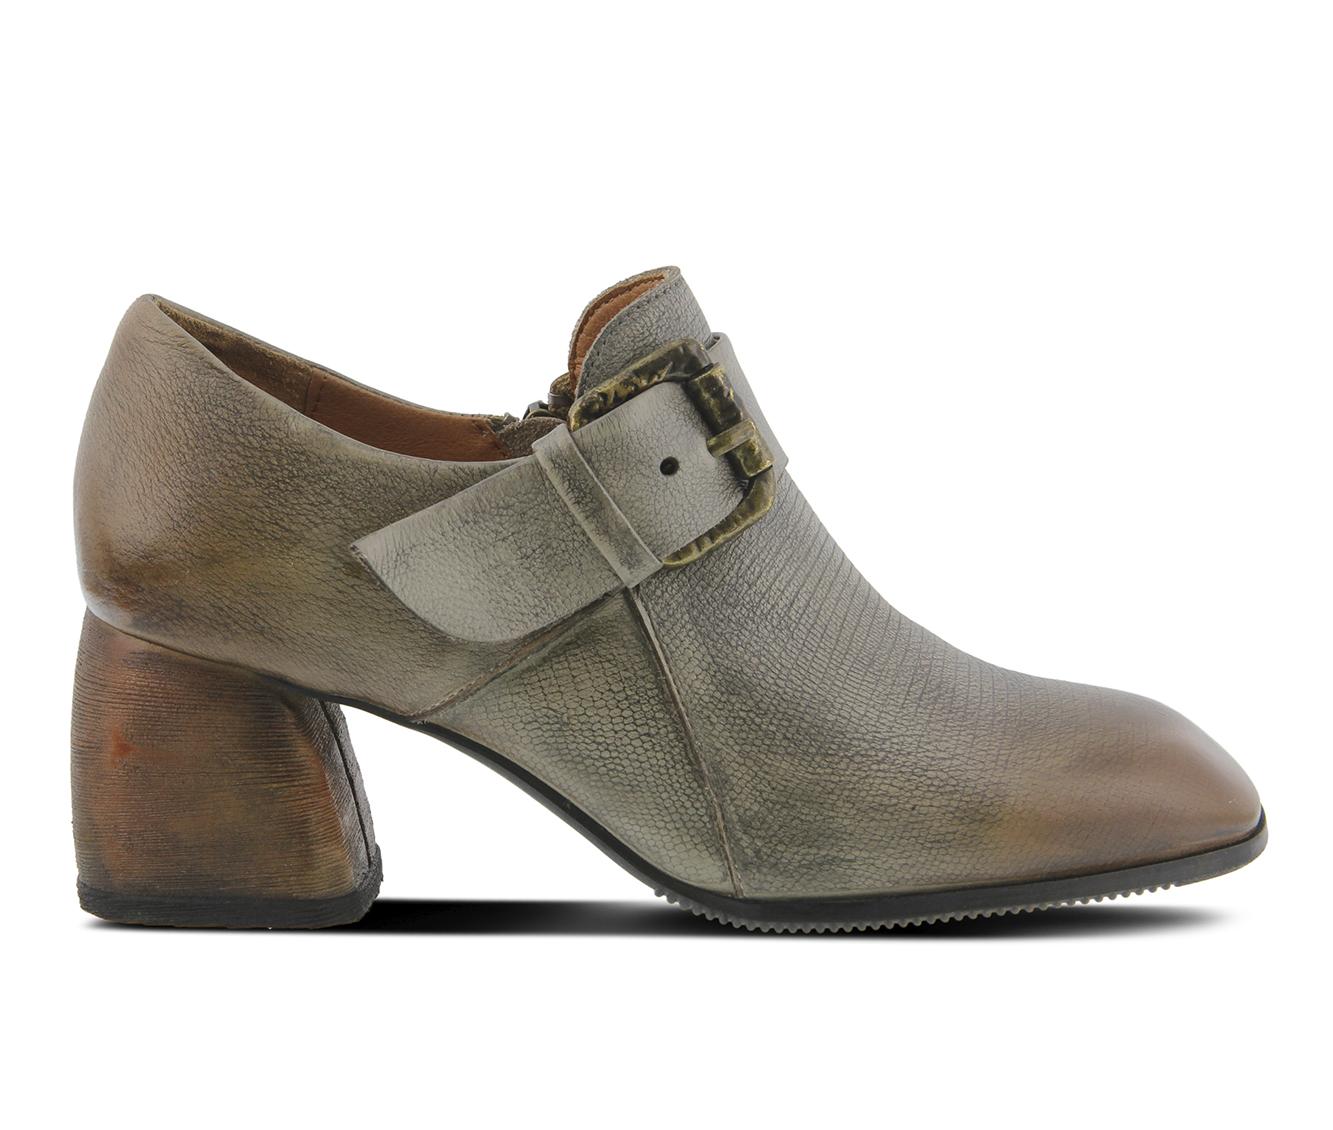 L'Artiste Mercedez Women's Dress Shoe (Gray Leather)